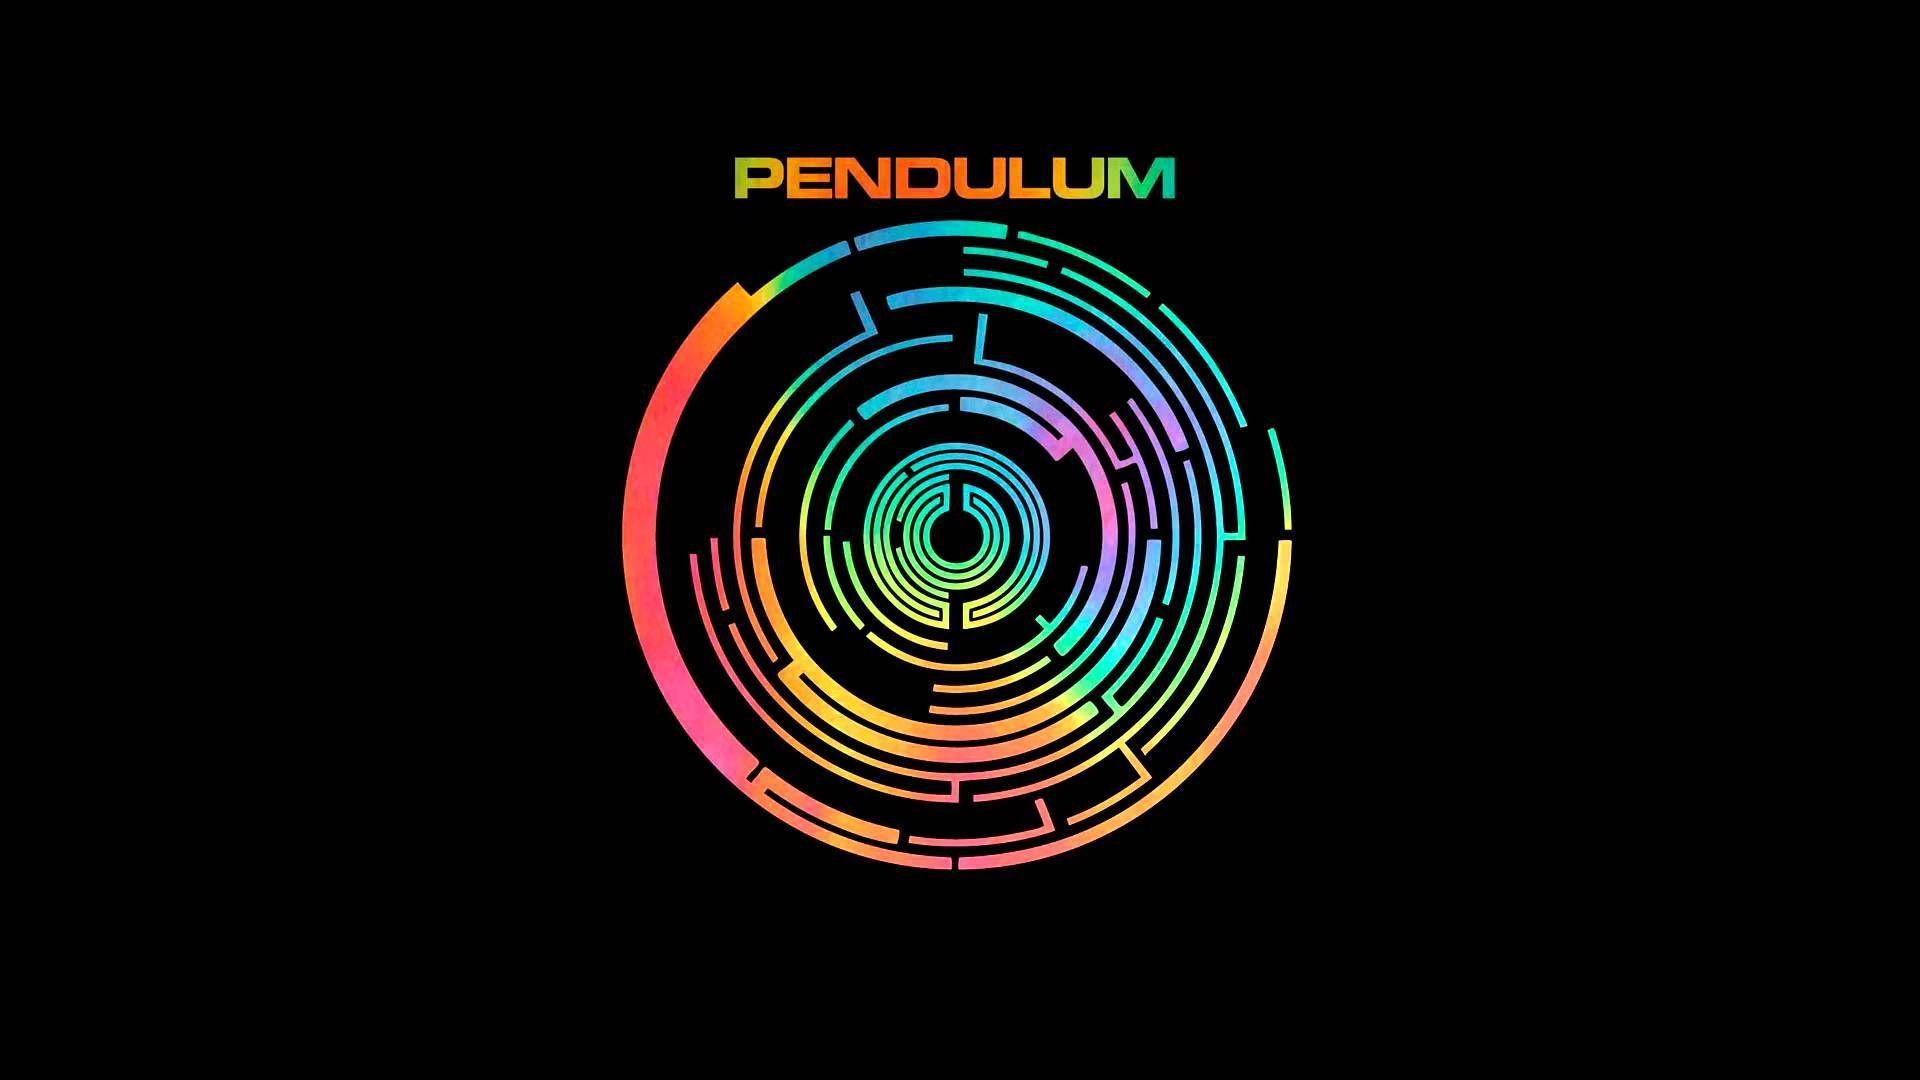 Viral 237 Zalo 191 Cu 225 Nto Sabes De Pendulum